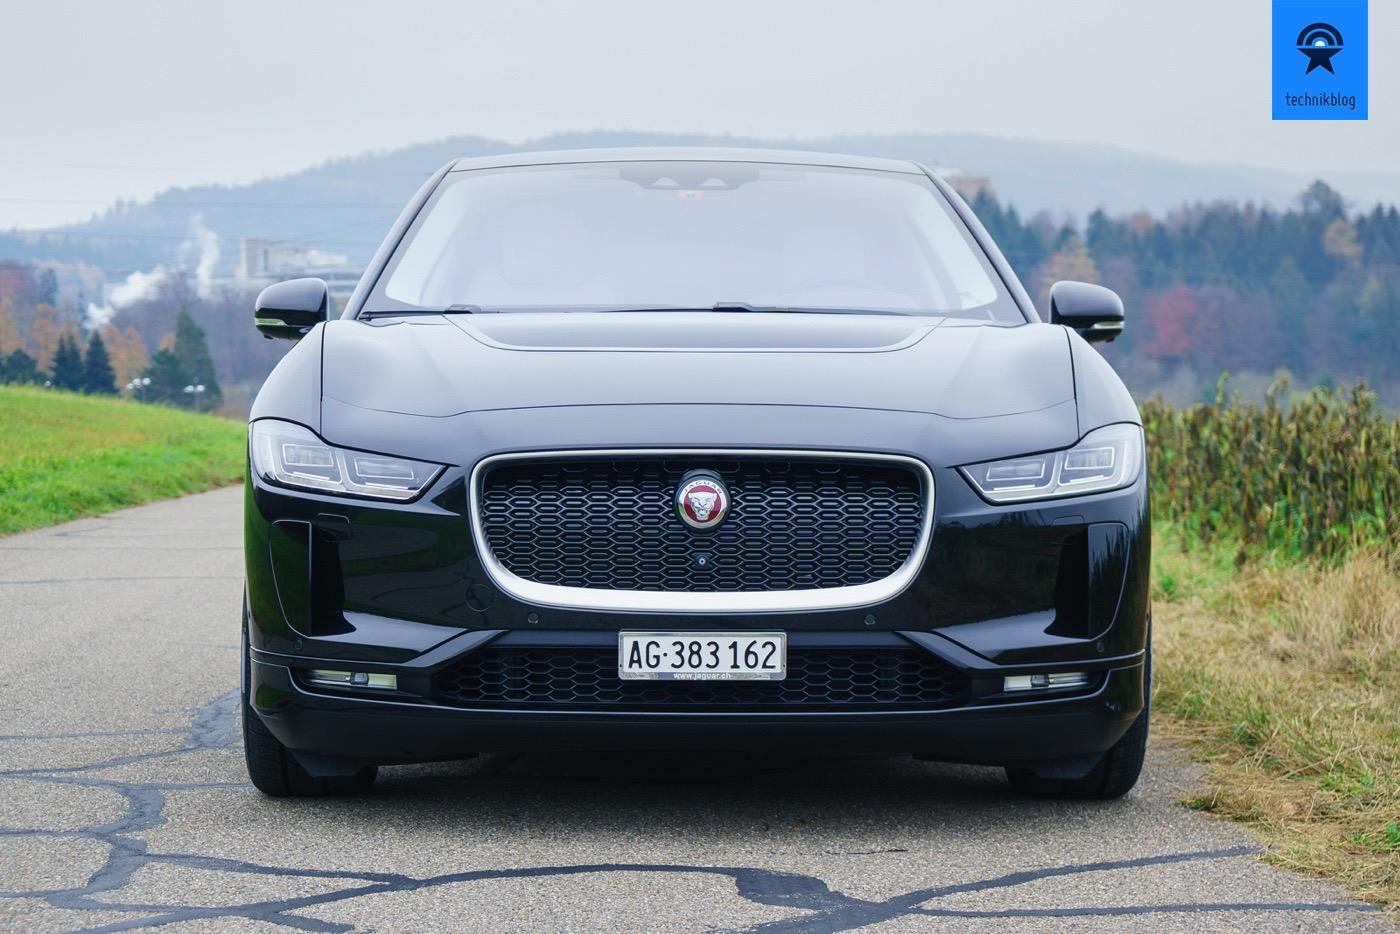 Die bullige Front des Jaguar I-Pace